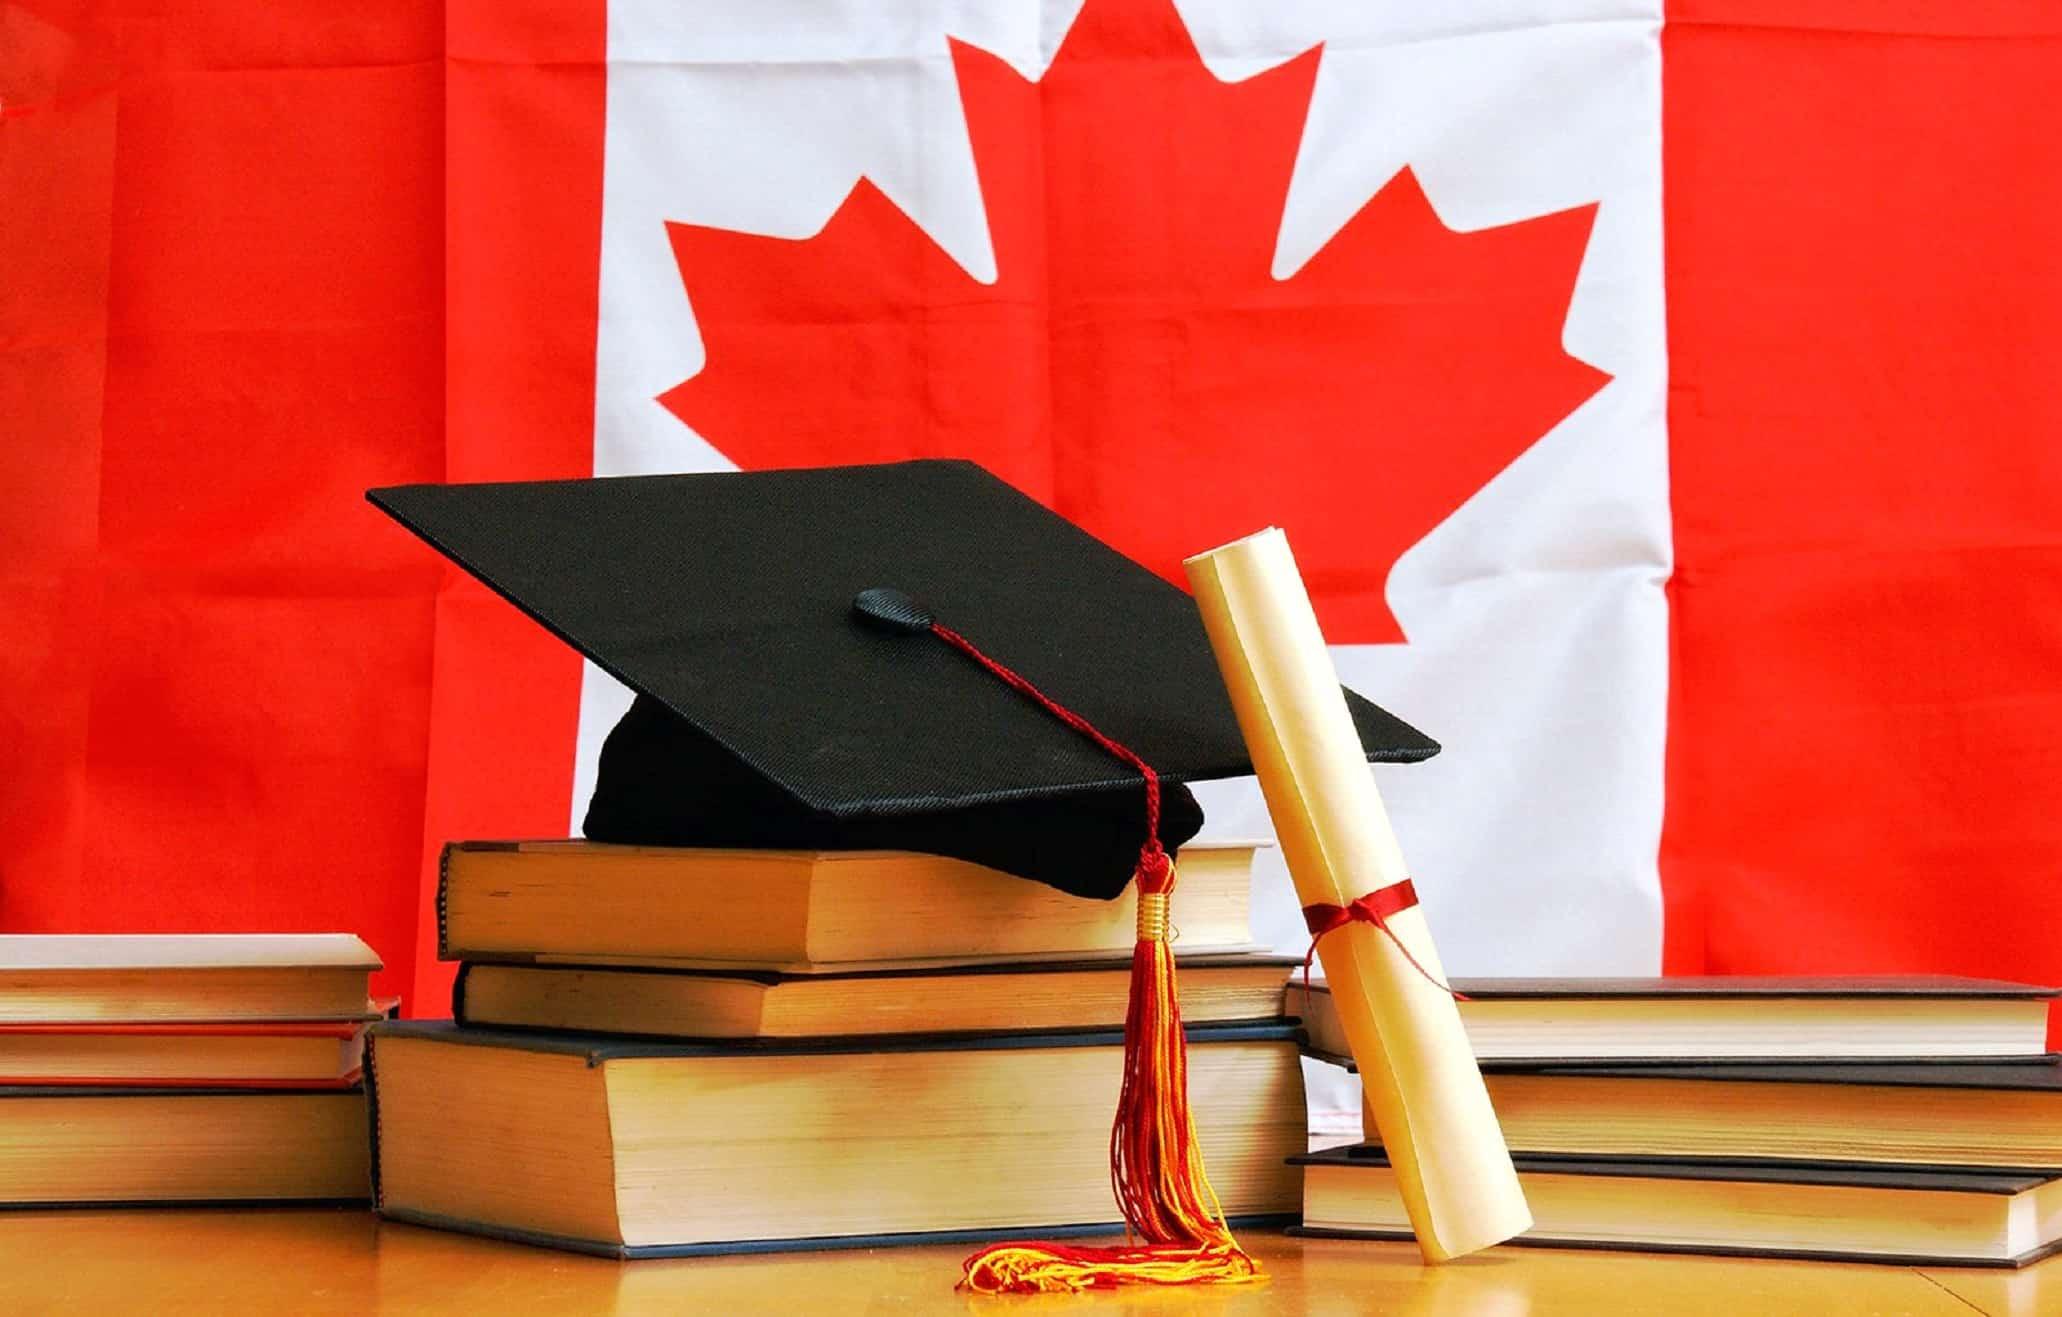 شرایط تحصیل در کانادا